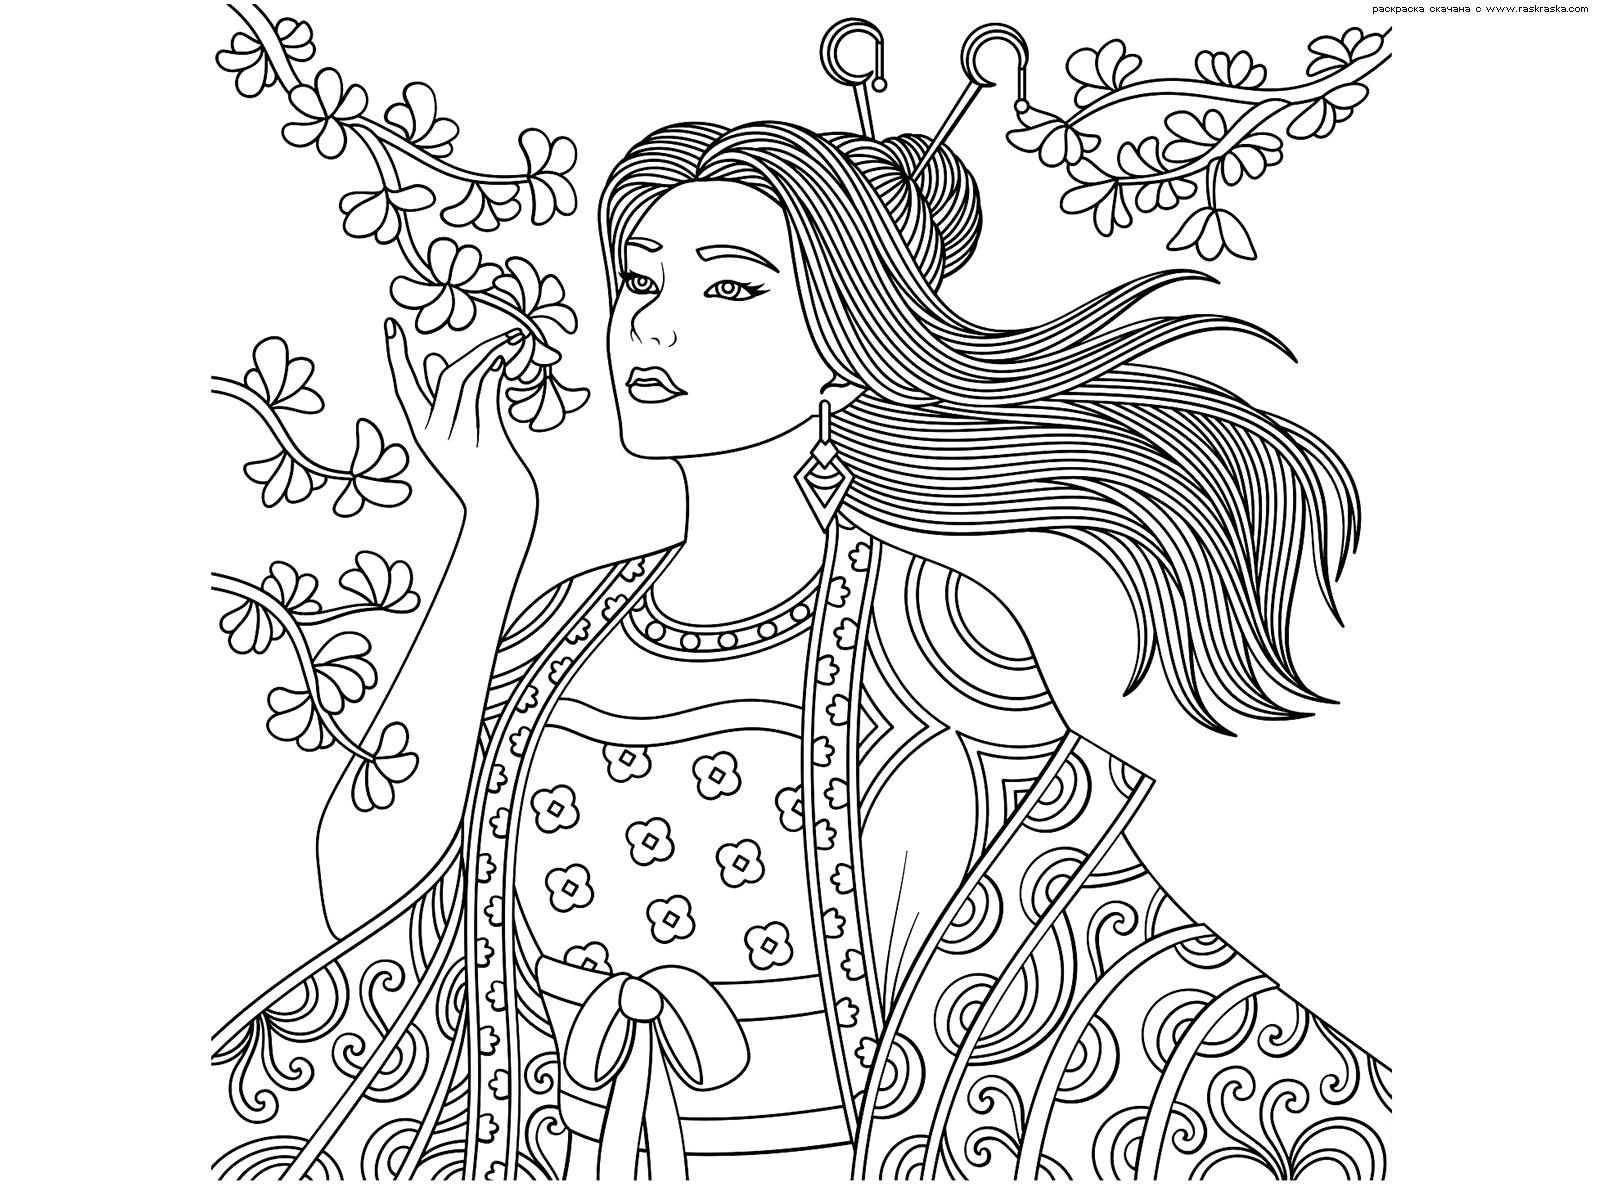 Раскраска Сакура. Раскраска антистресс